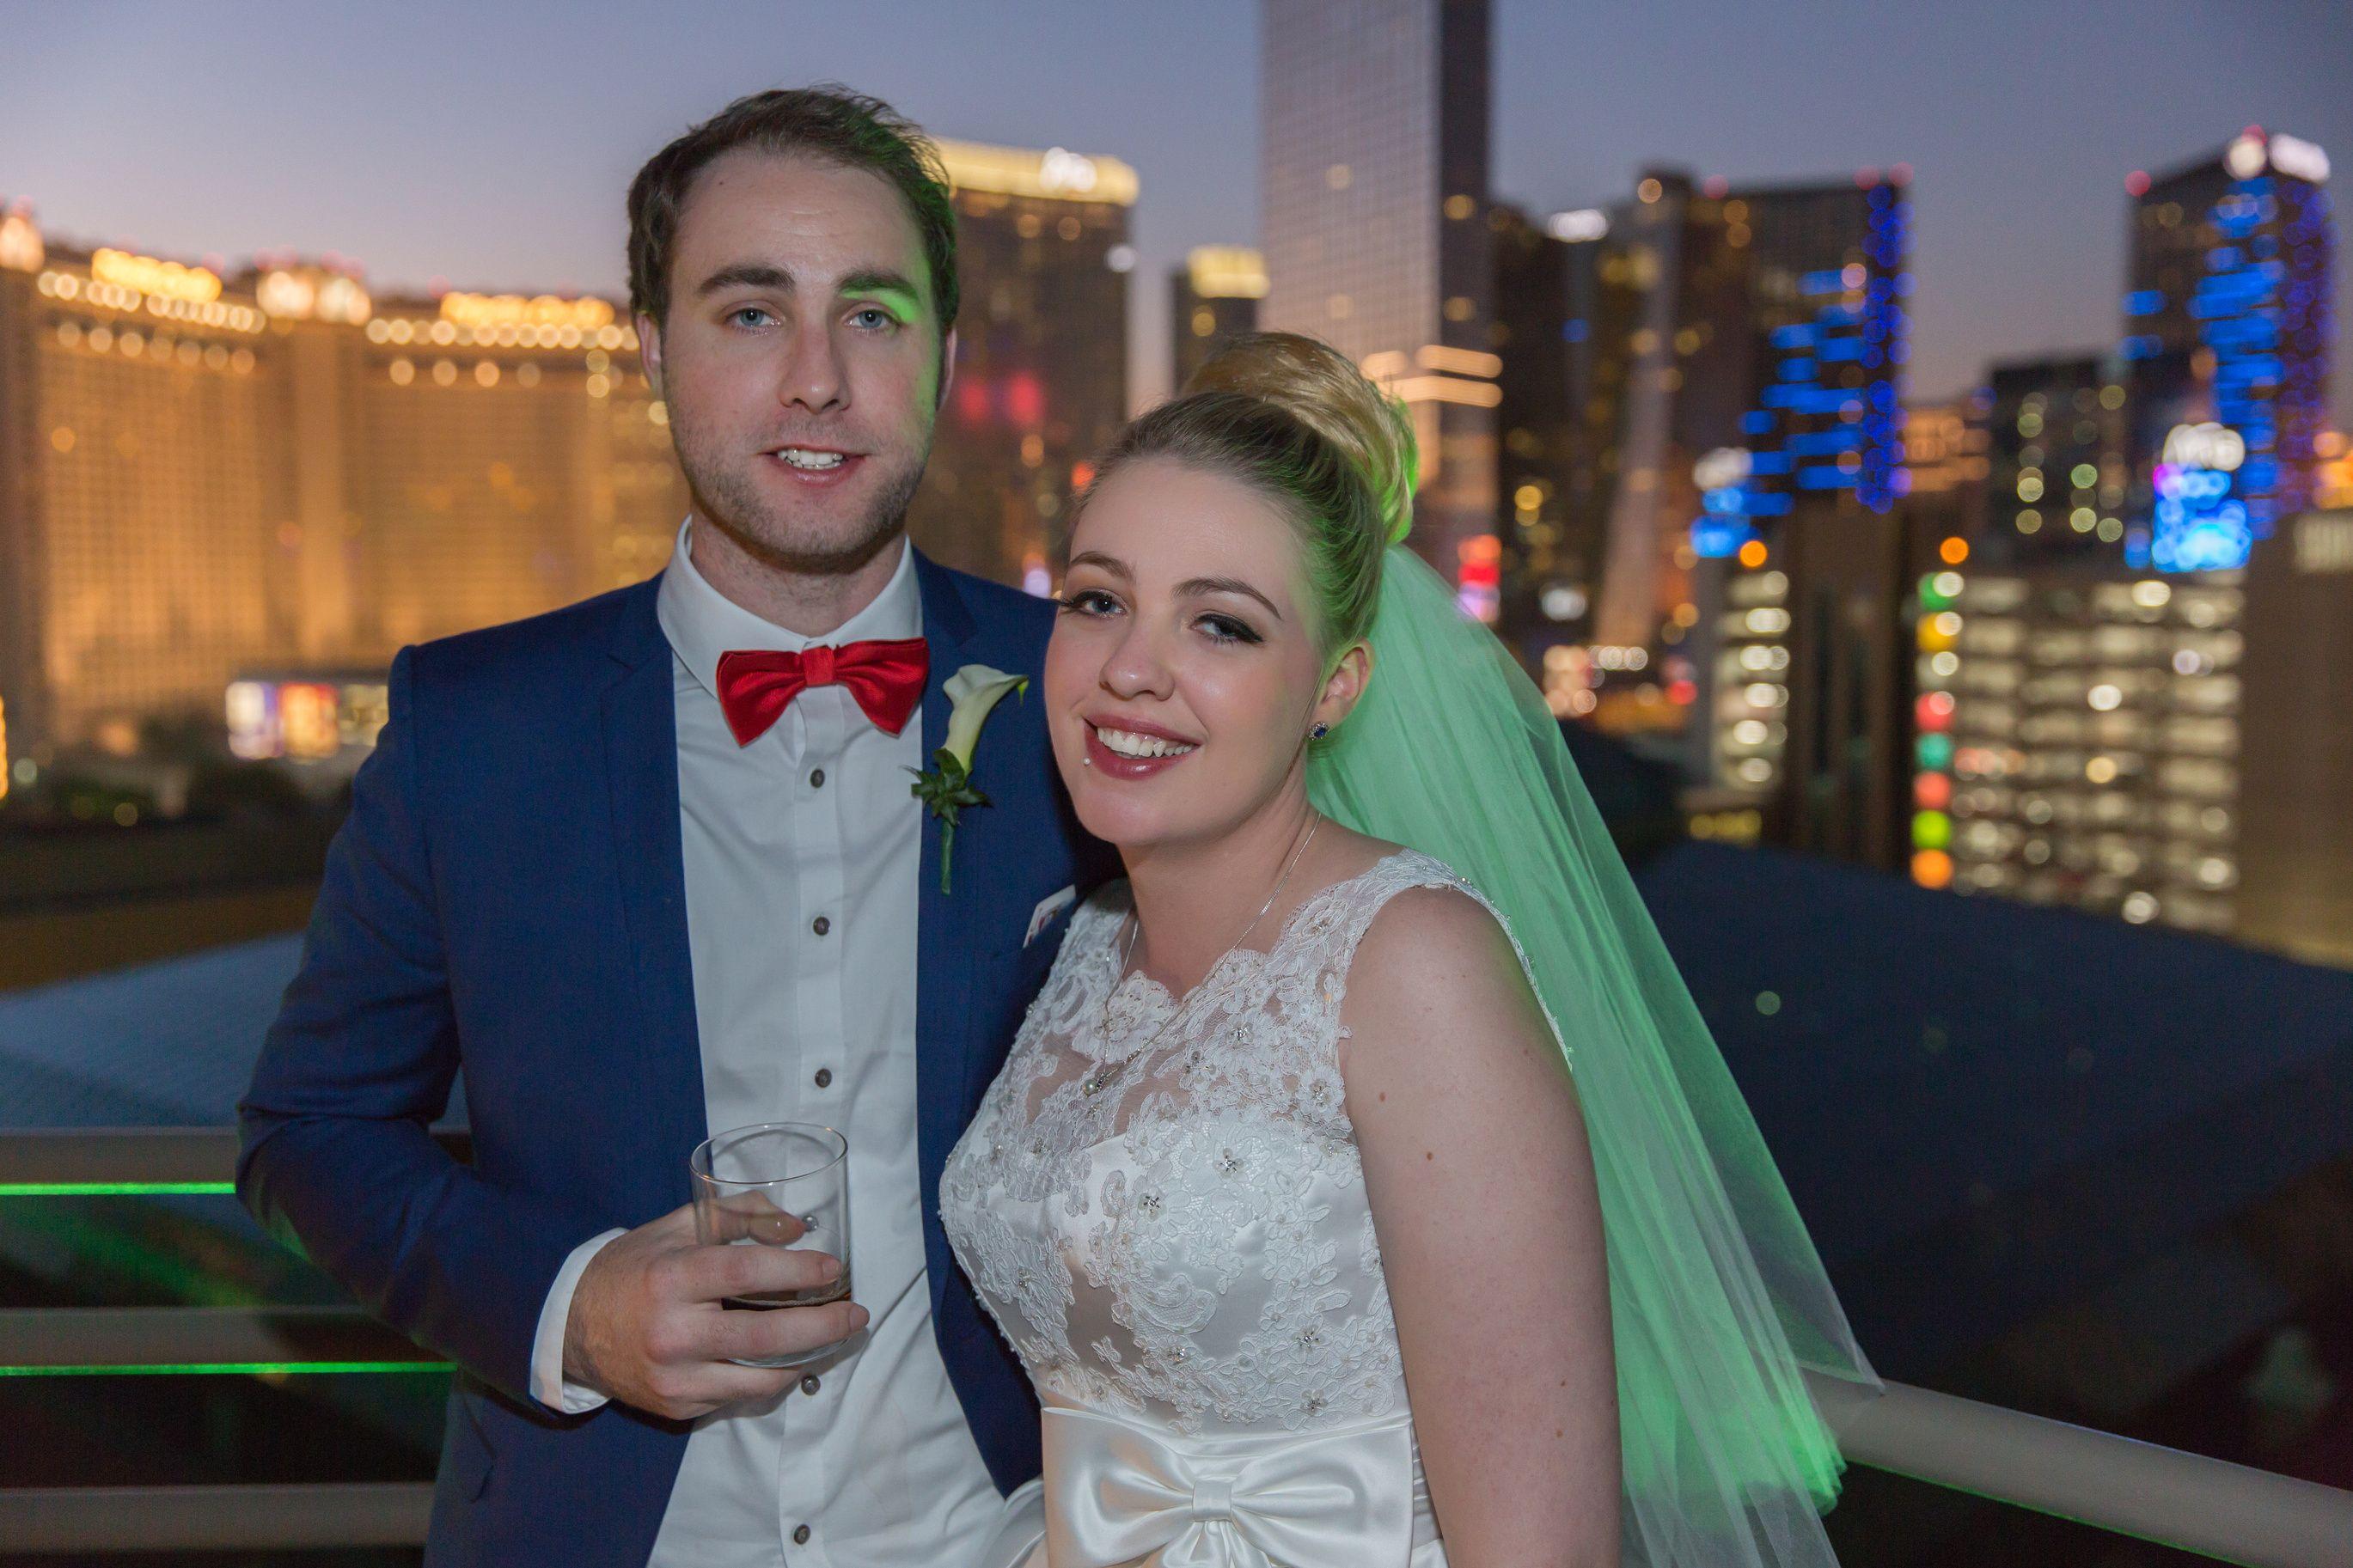 #vegaswedding #wedding #lasvegas #lasvegaswedding